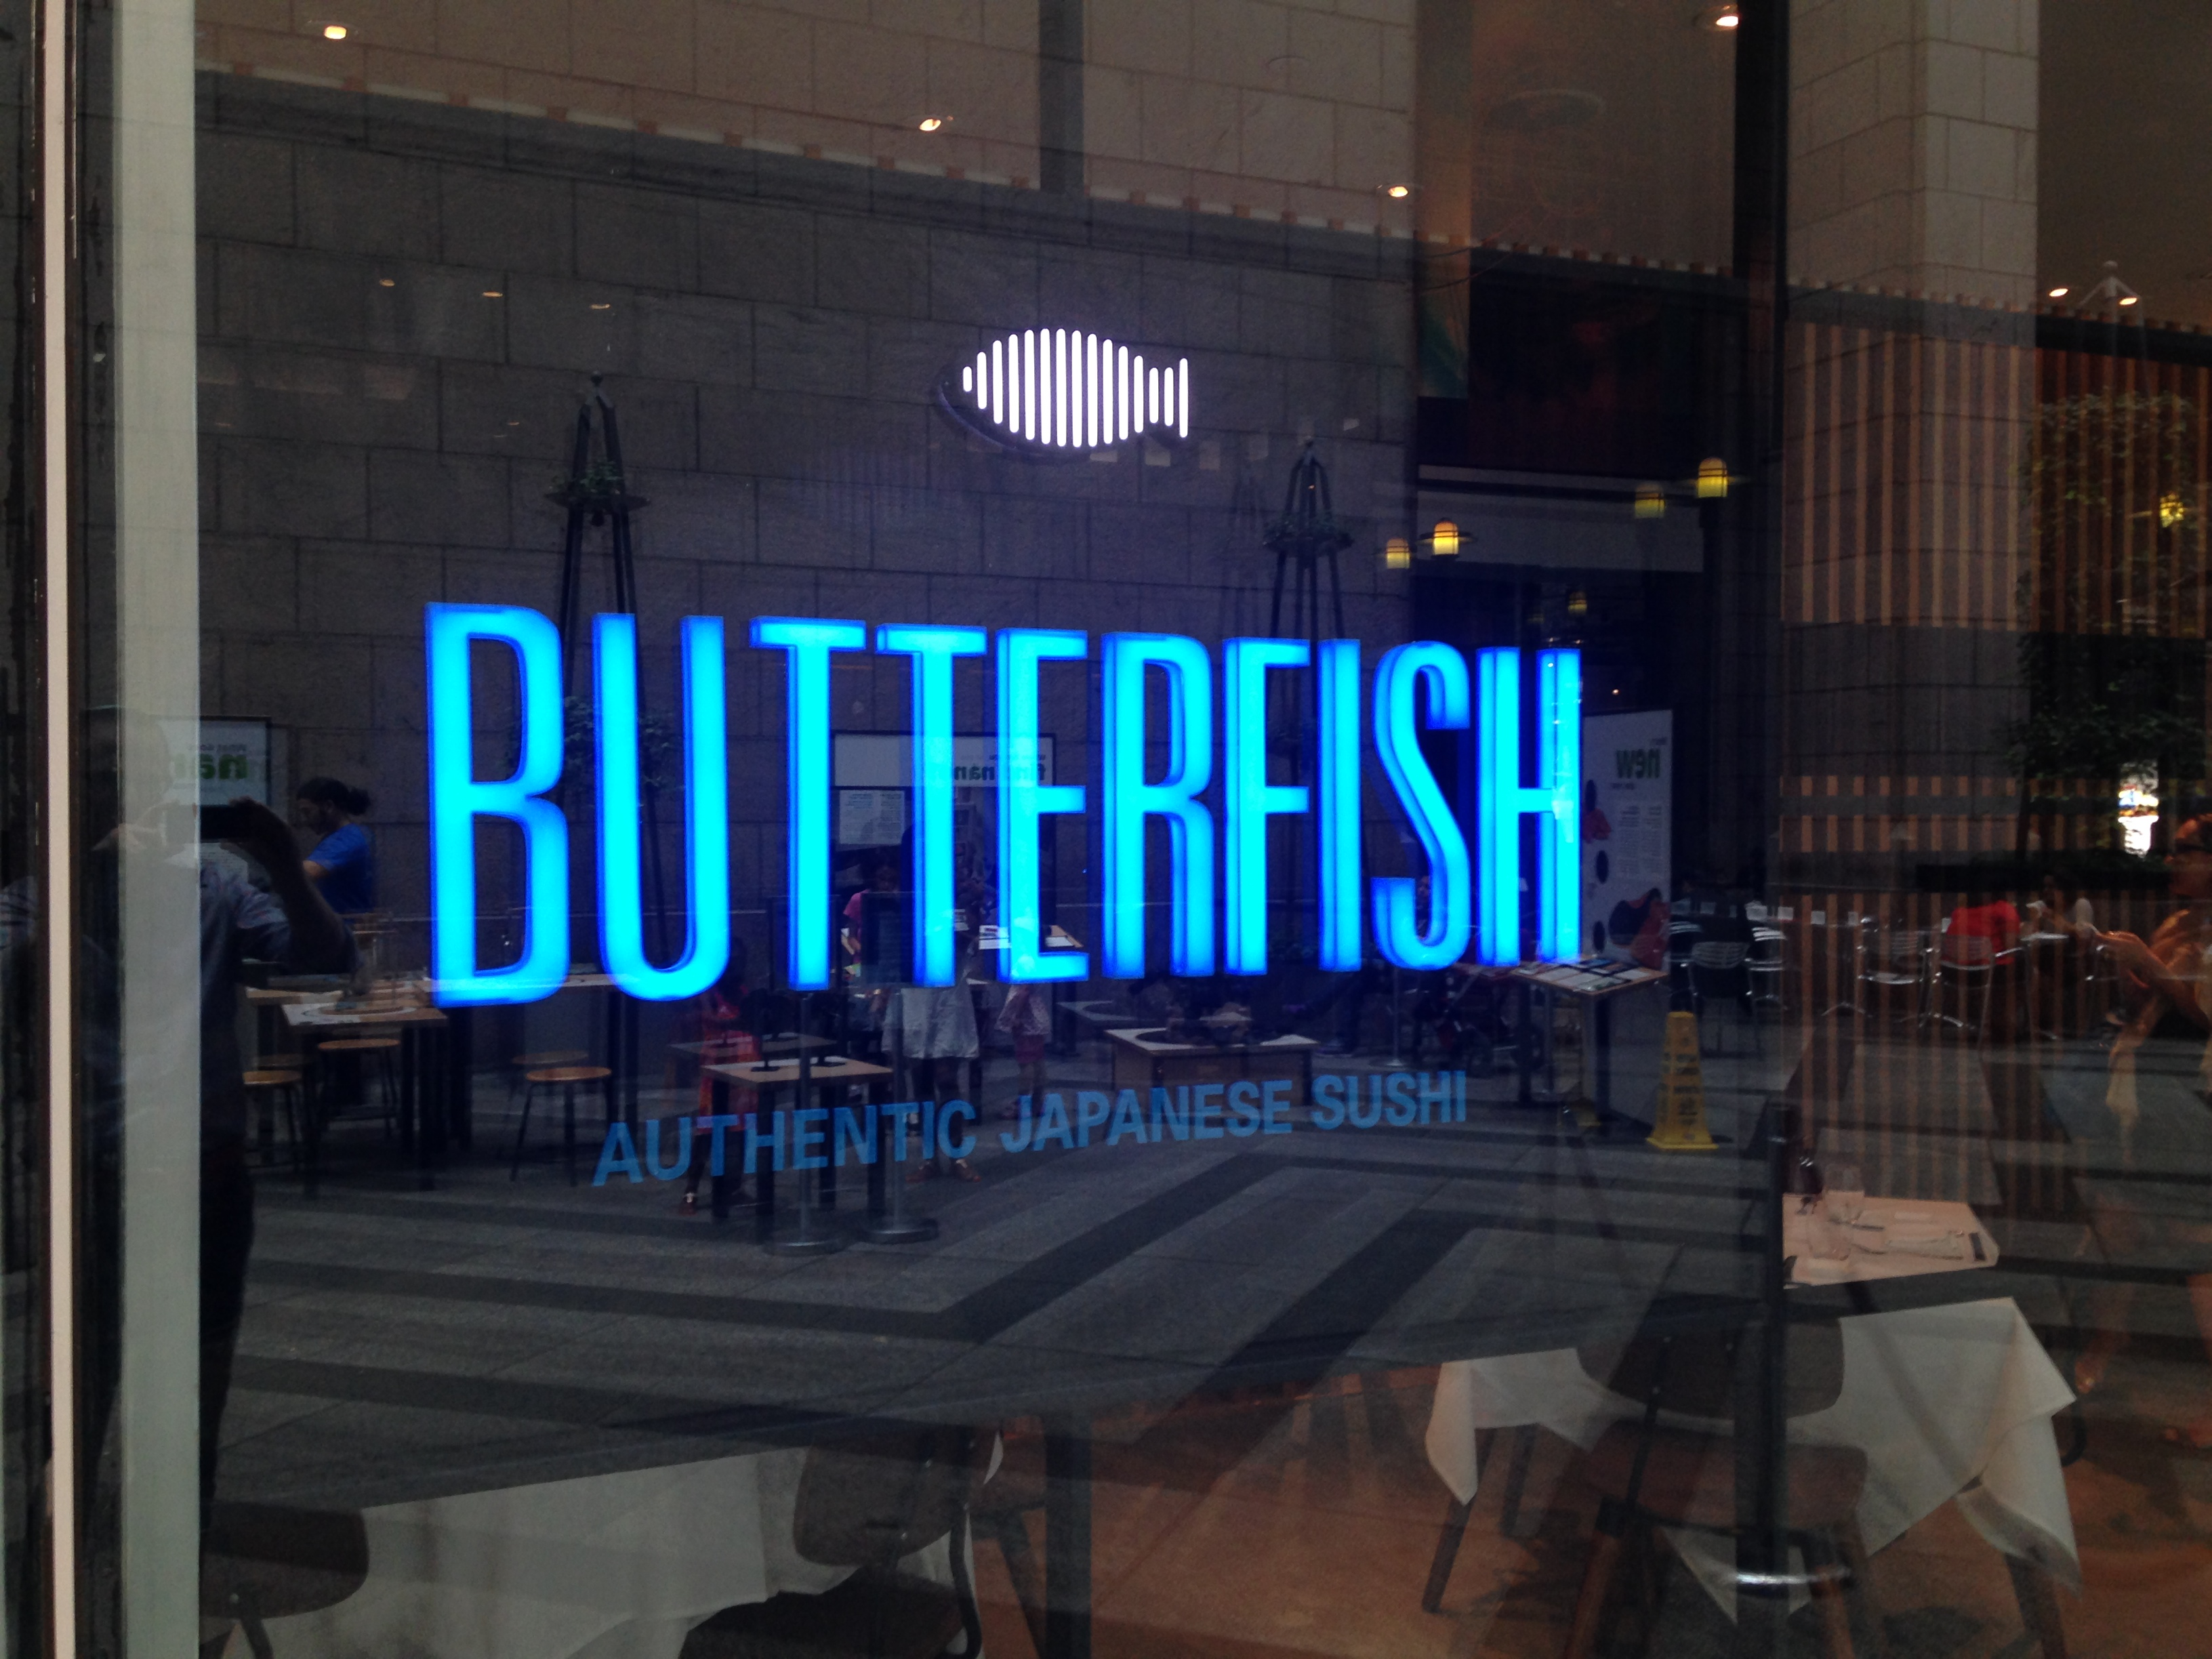 Butterfish New York Ny Kosher Restaurant Review